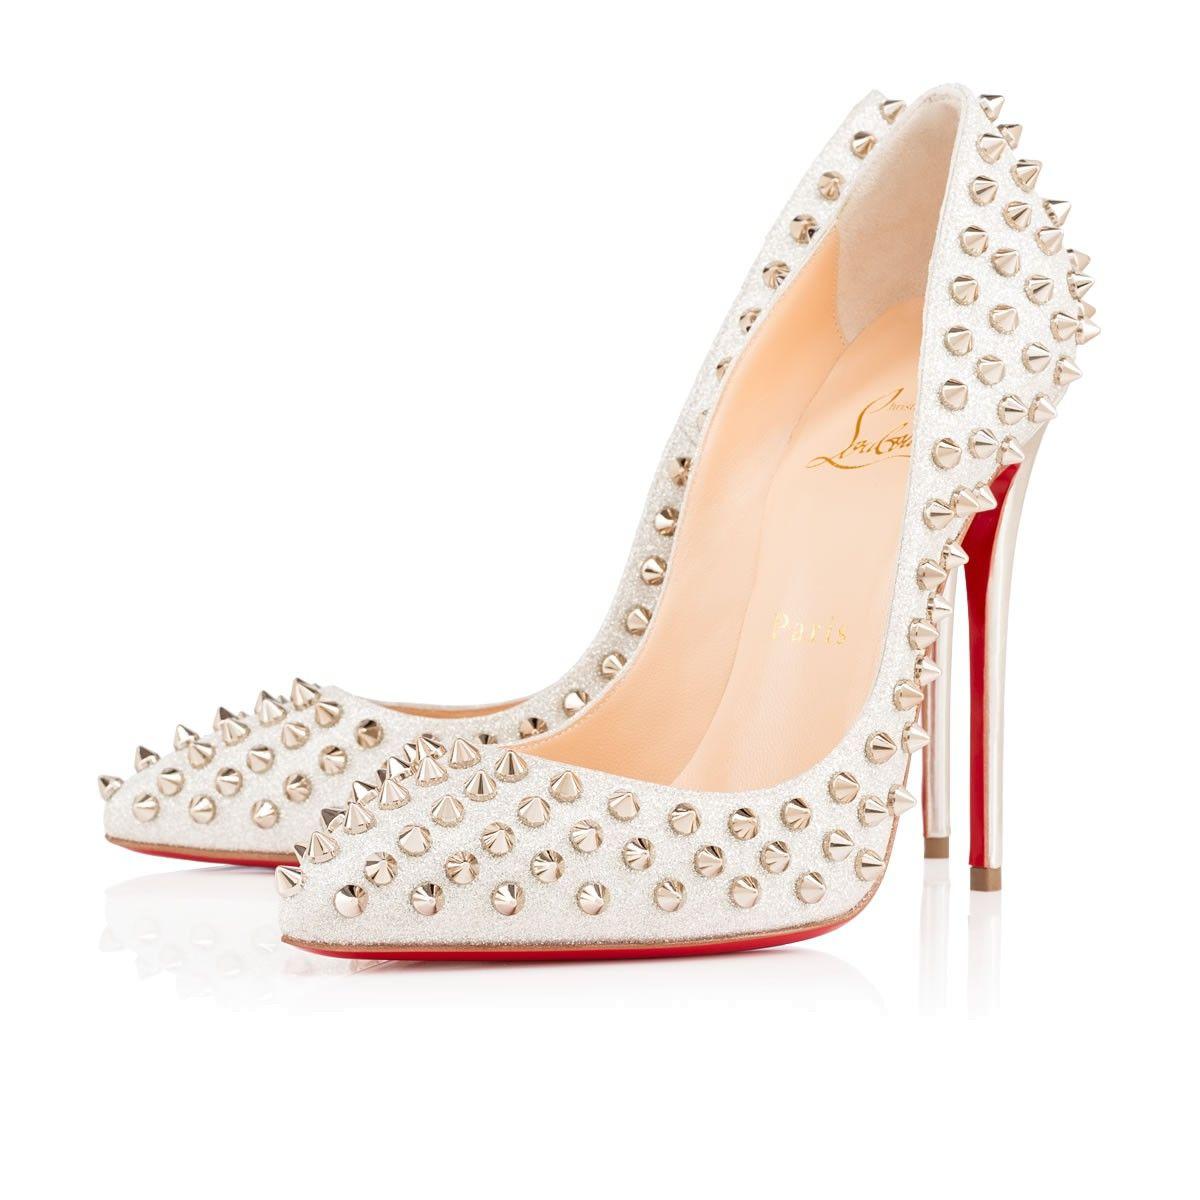 Women Shoes - Follies Spikes Glitter Mini - Christian Louboutin